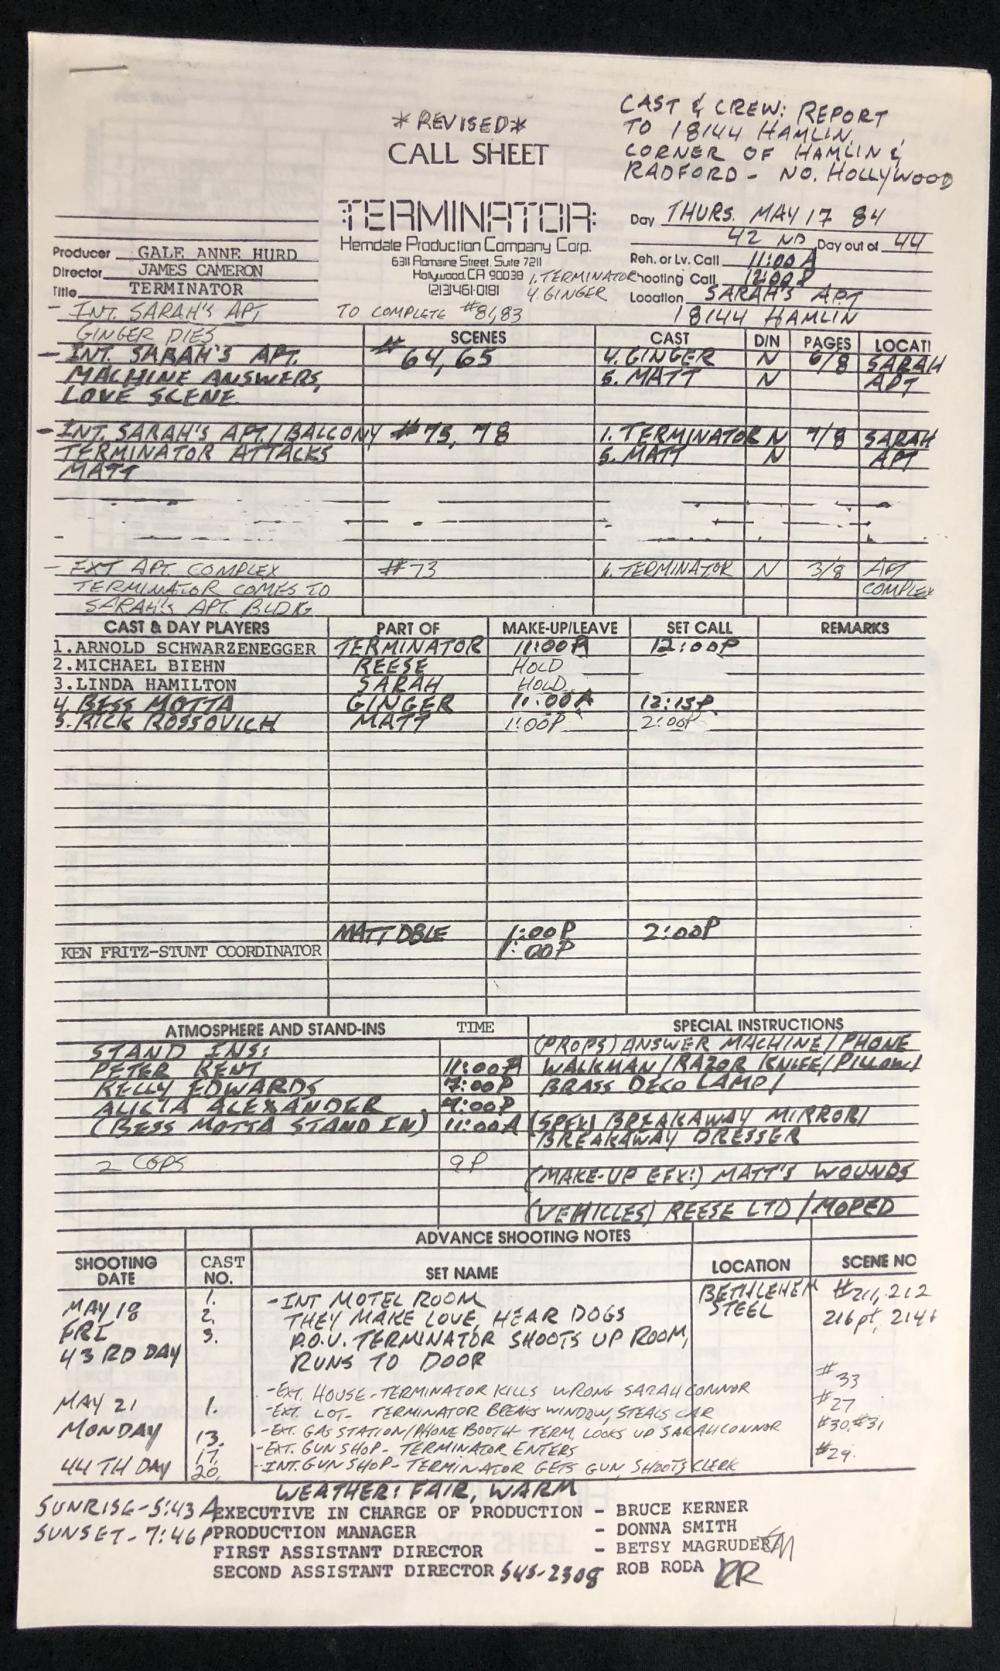 Lot 121: The Terminator (1984) - Original Call Sheet - 5-17-84